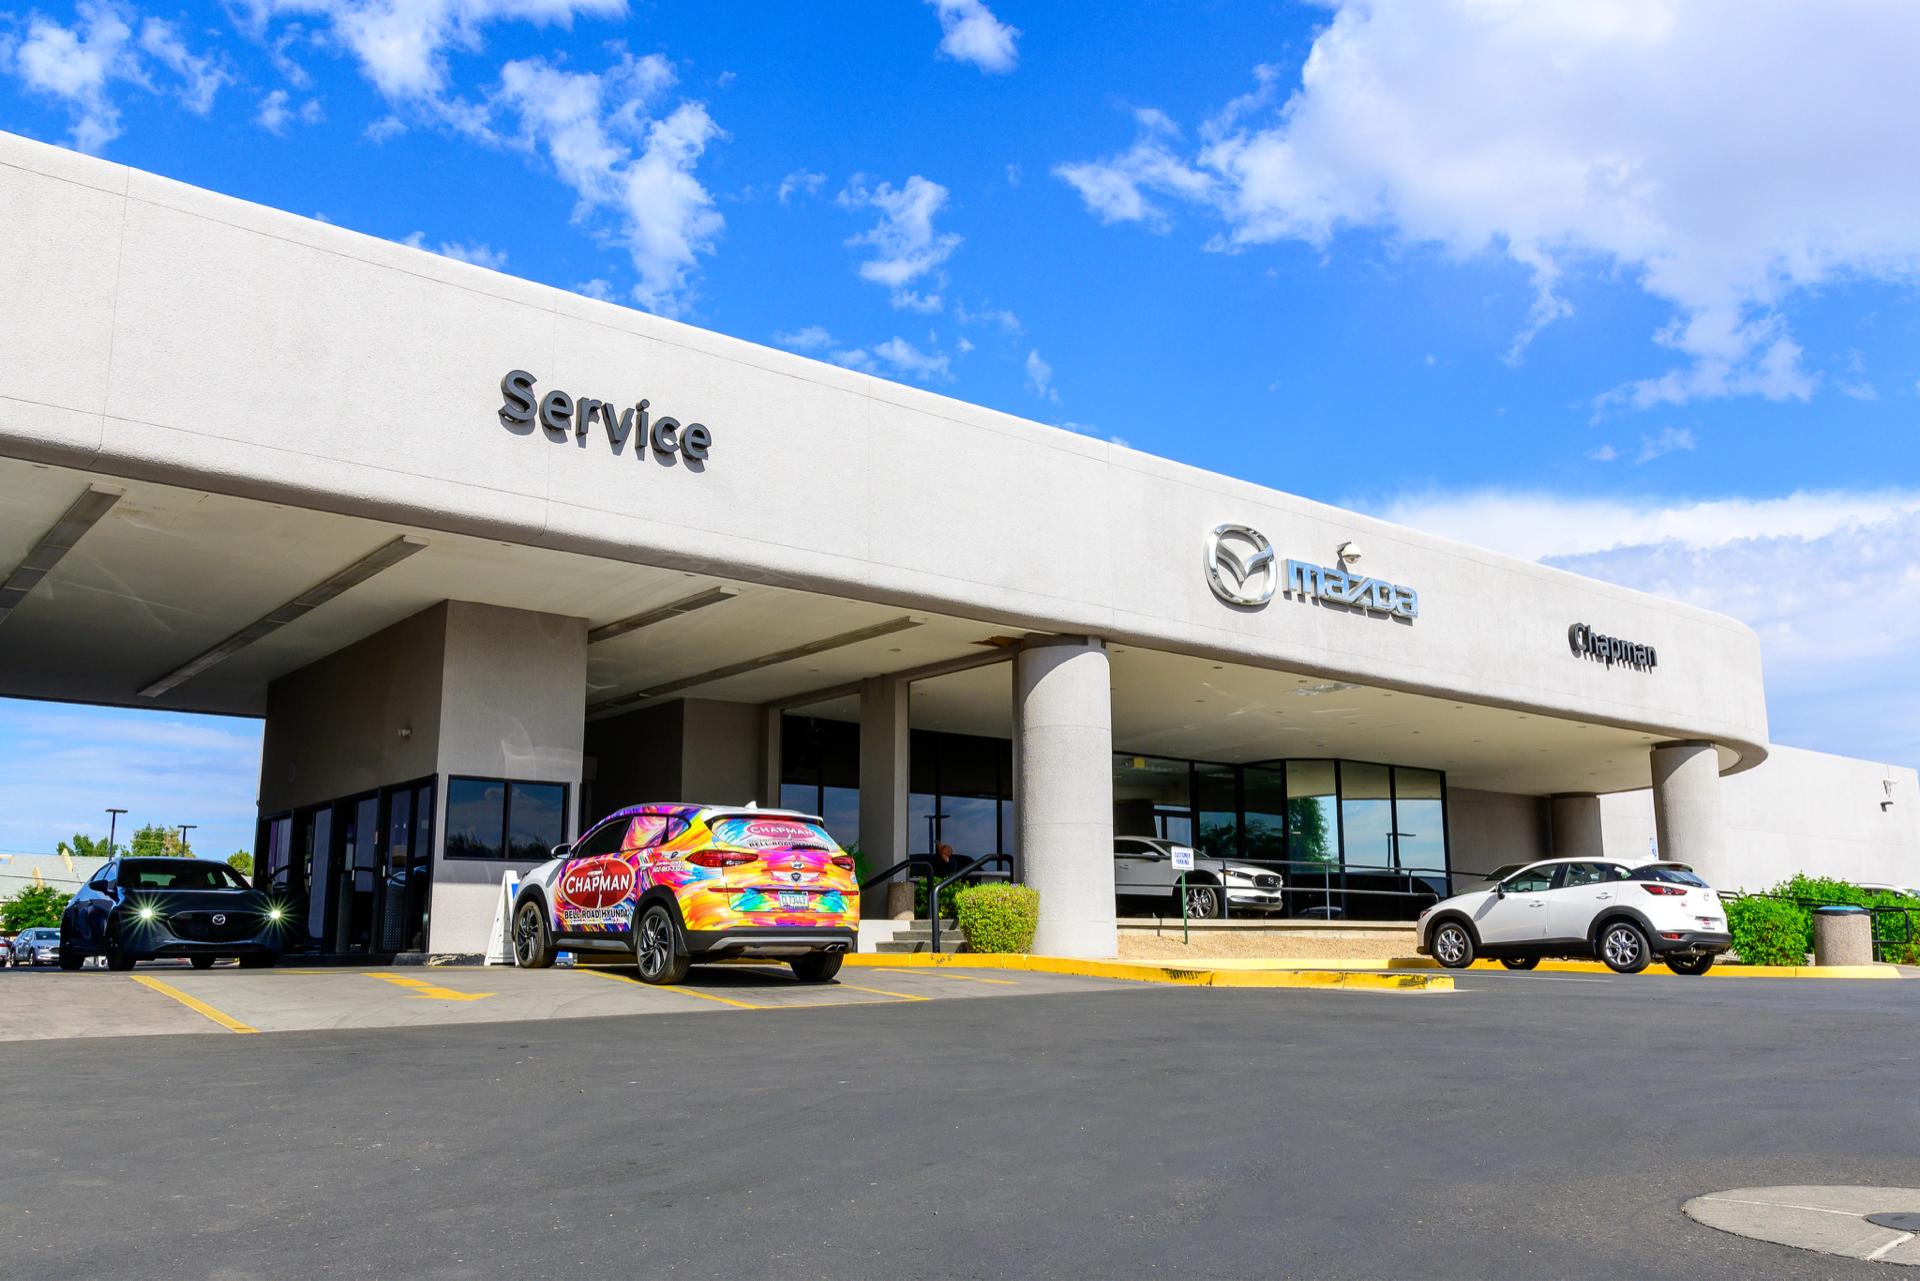 Chapman Mazda service center entrance